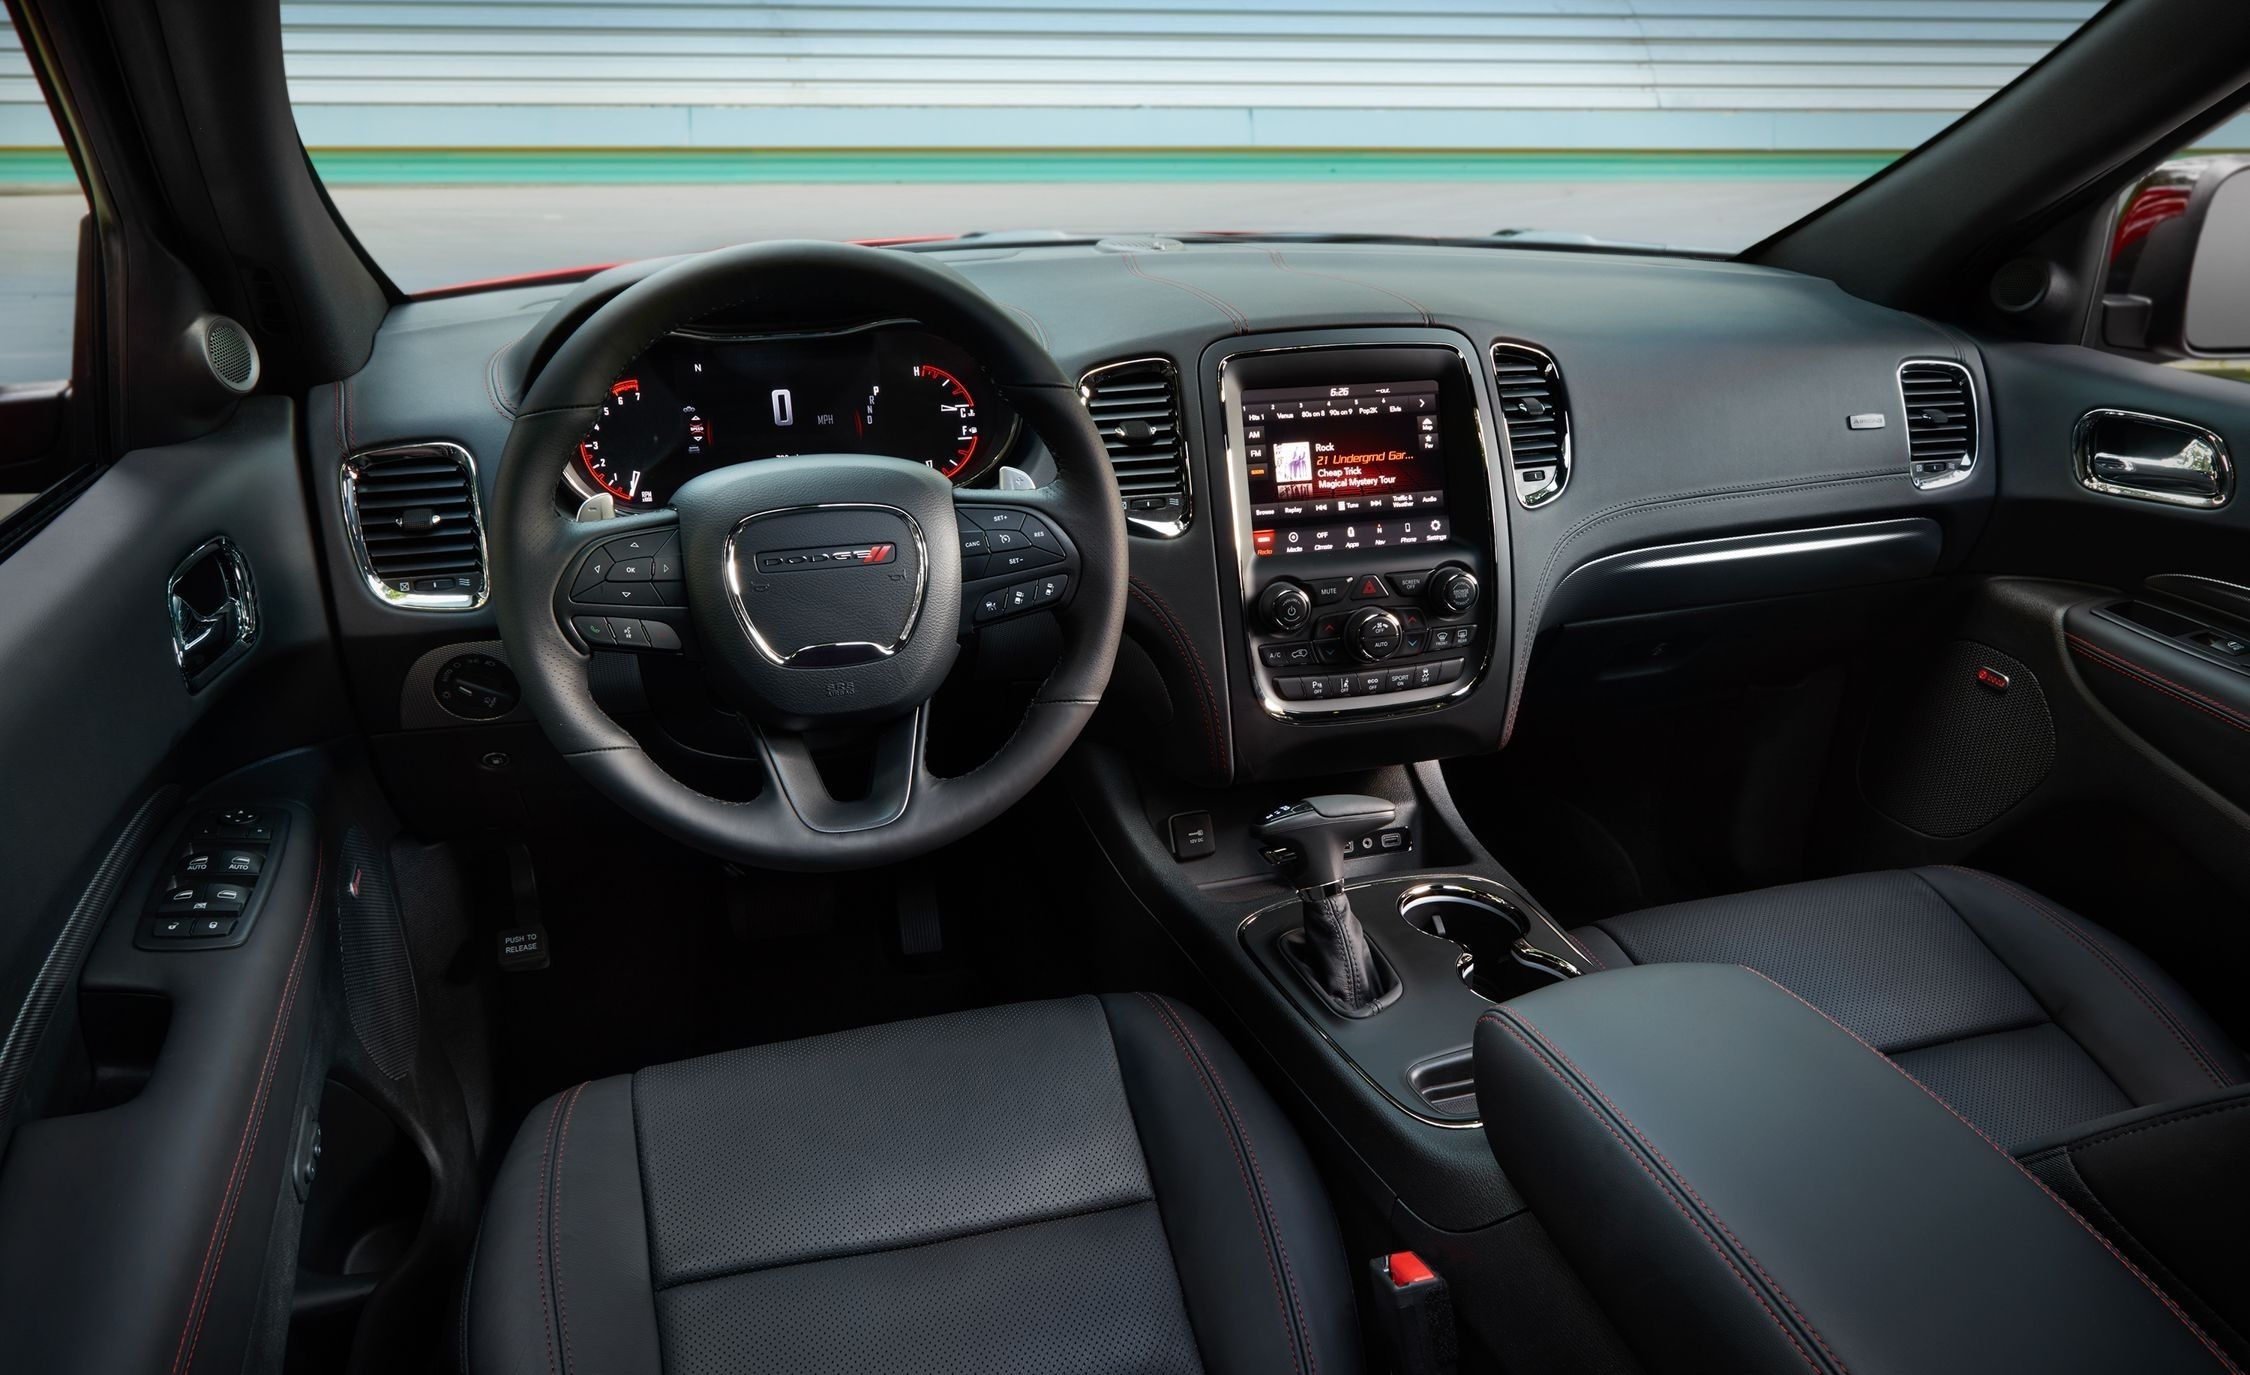 2019 Dodge Durango Interior Exterior Dodge Durango Dodge Durango Interior Dodge